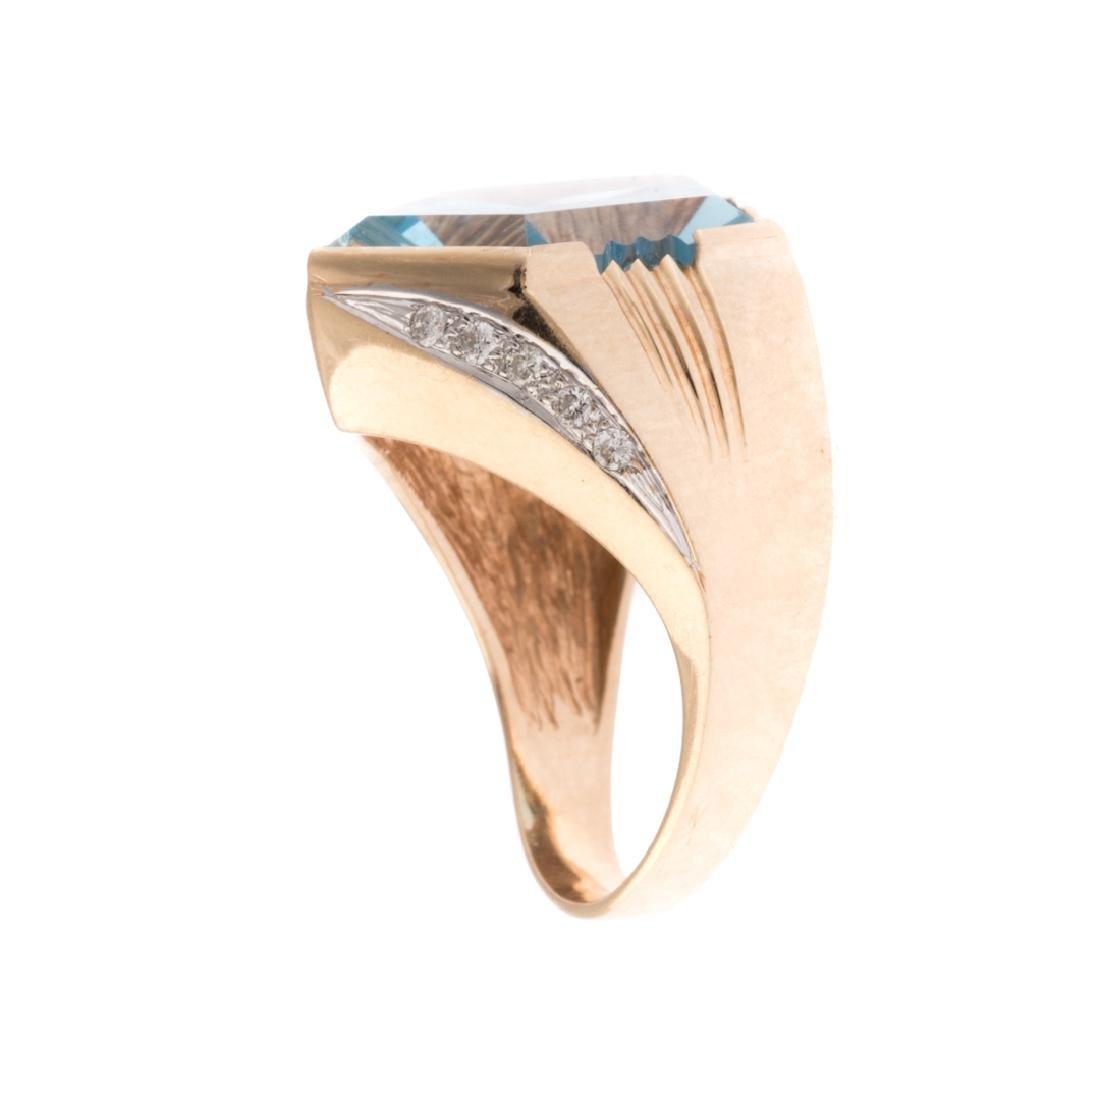 A Lady's Contemporary Blue Topaz & Diamond Ring - 2